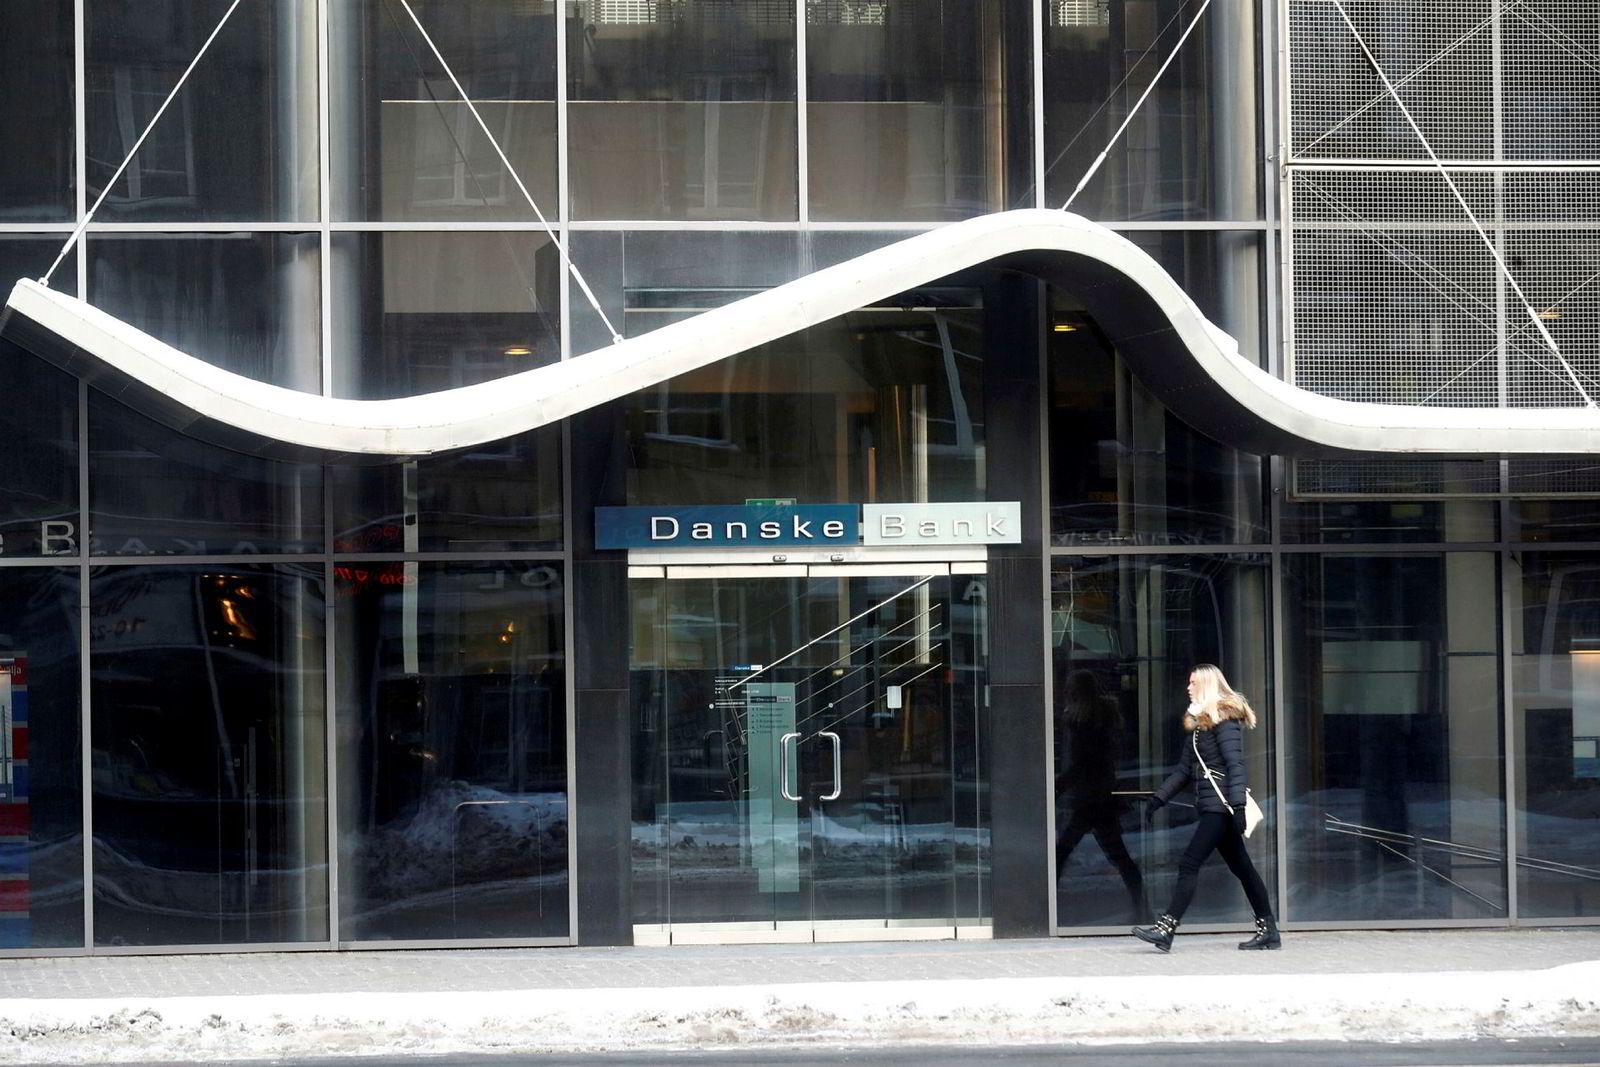 Fra Danske Banks tidligere filial i Estland, som nå er stengt.